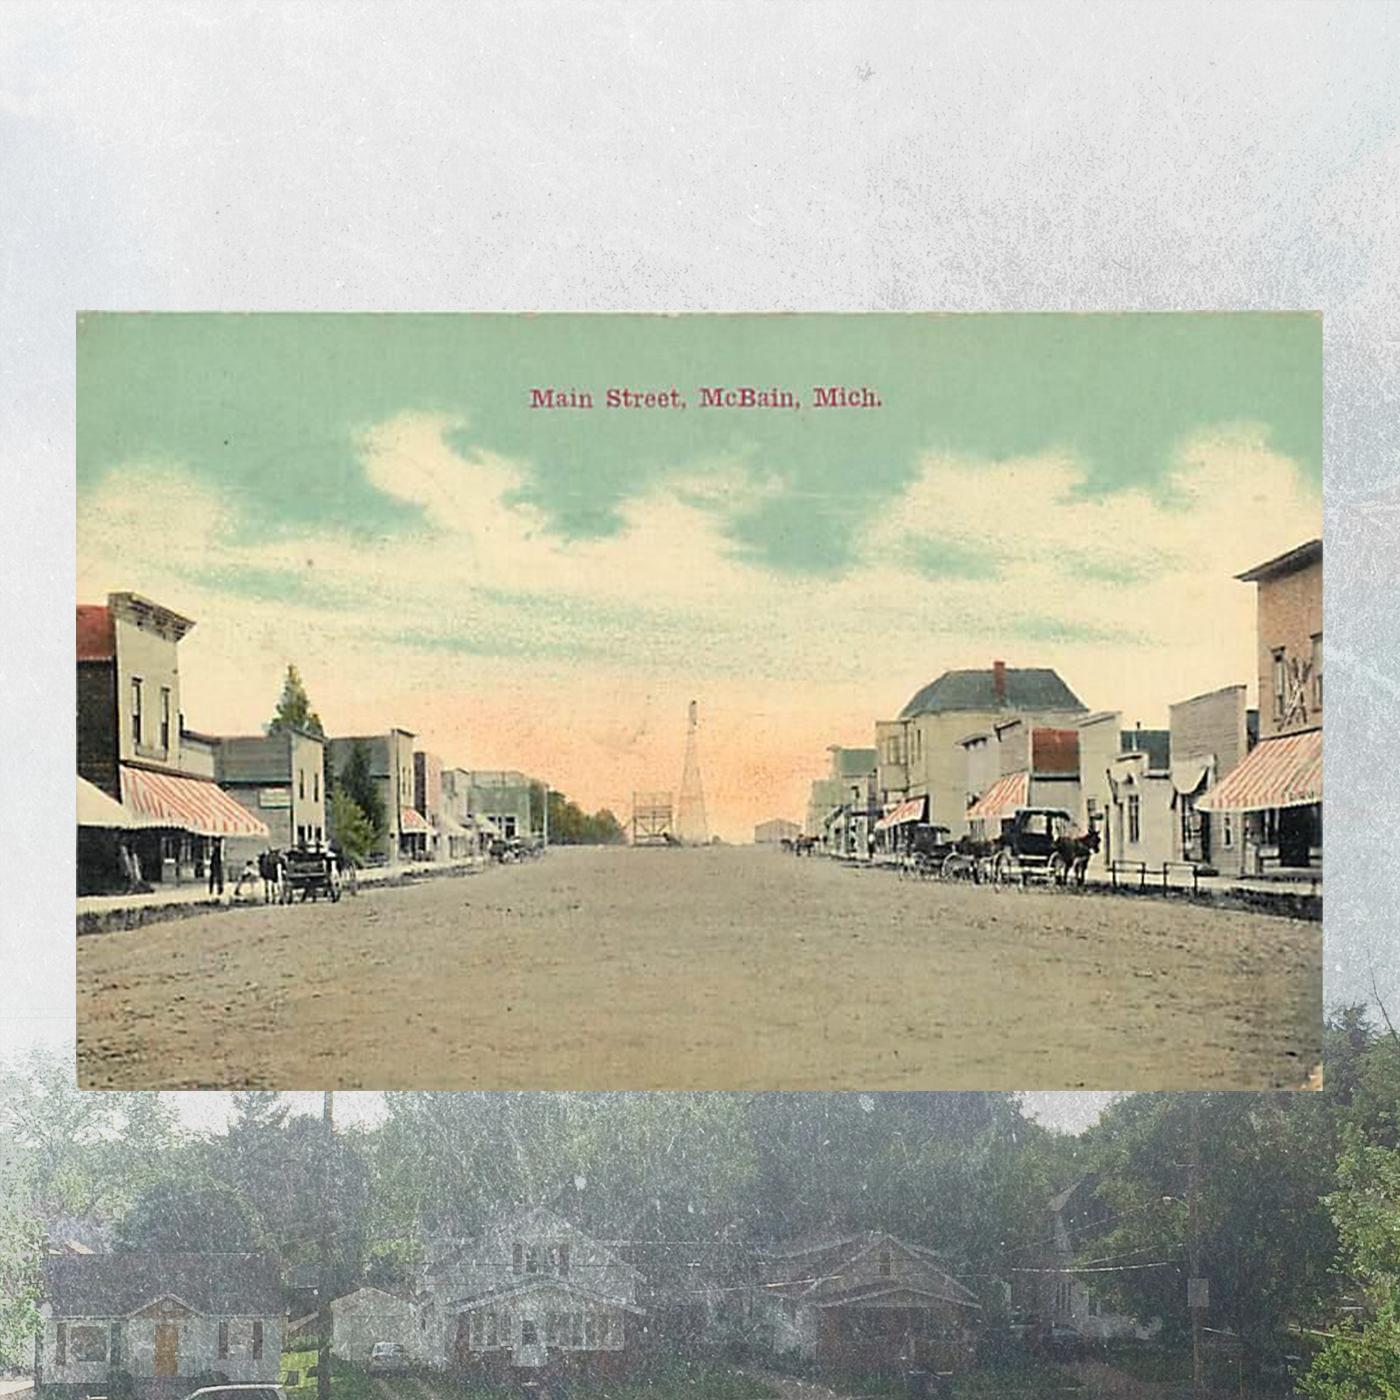 Postcard from McBain, Michigan